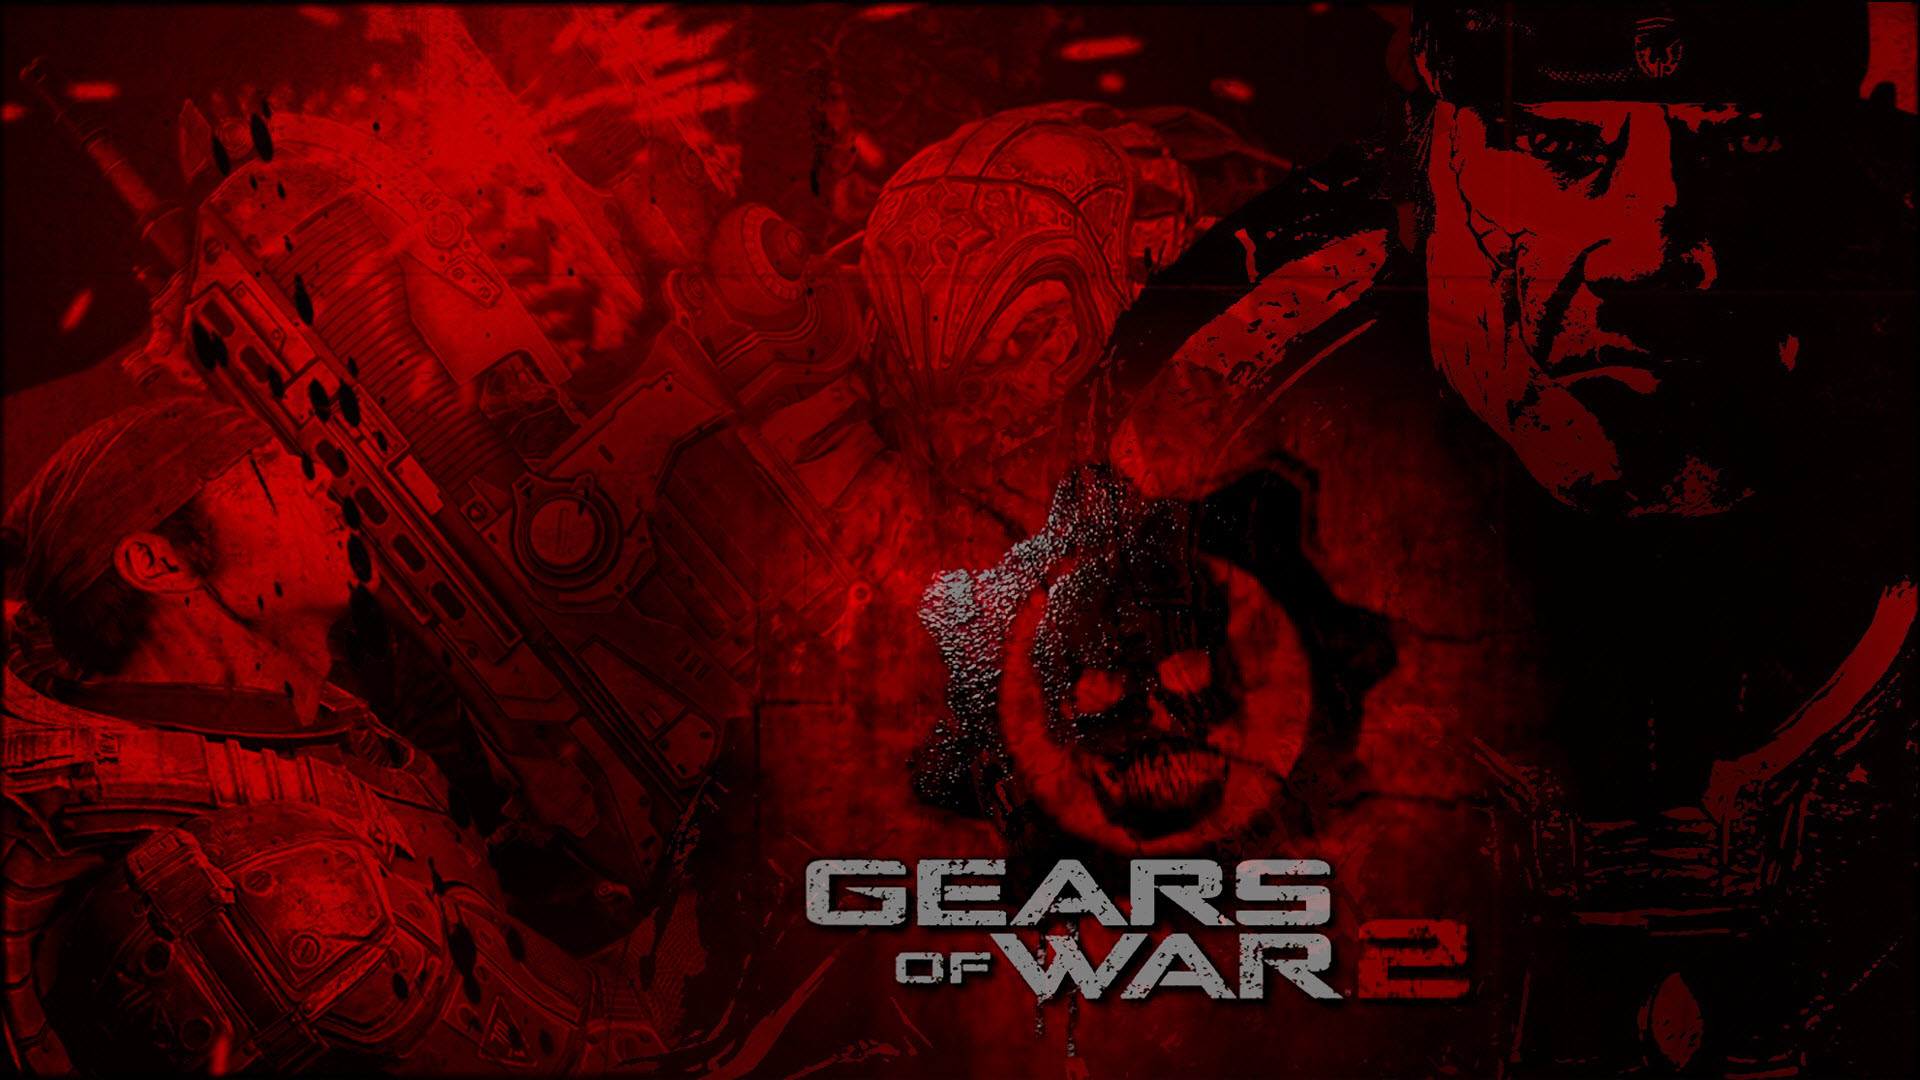 Gears Of War 2 Game Wallpapers Wallpapers Hd